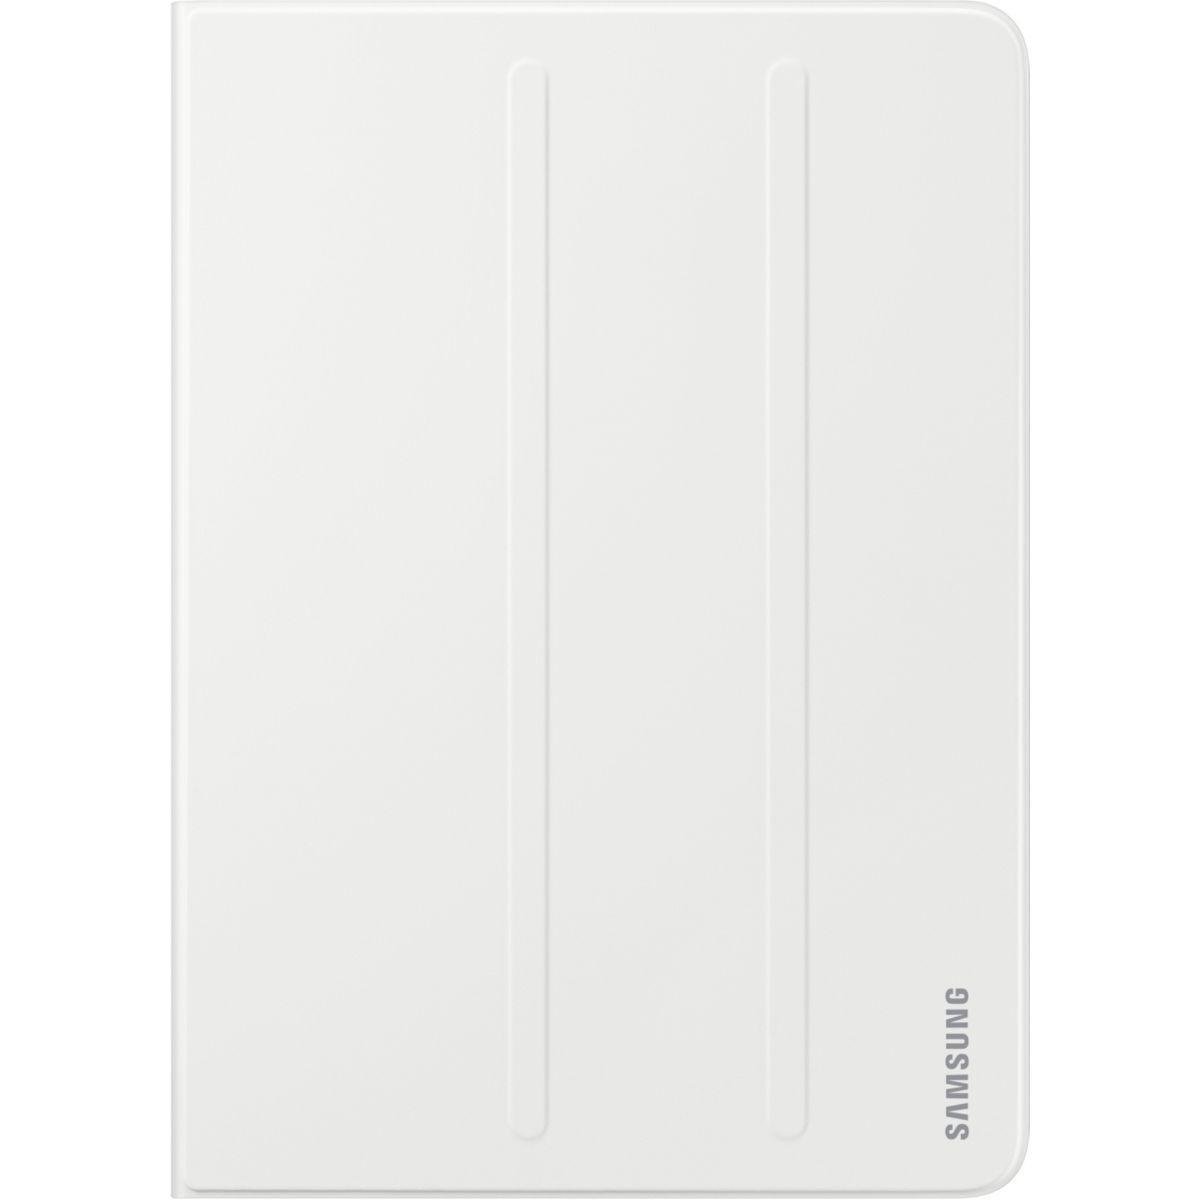 Etui tablette samsung book cover tab s3 blanc - livraison offerte : code premium (photo)